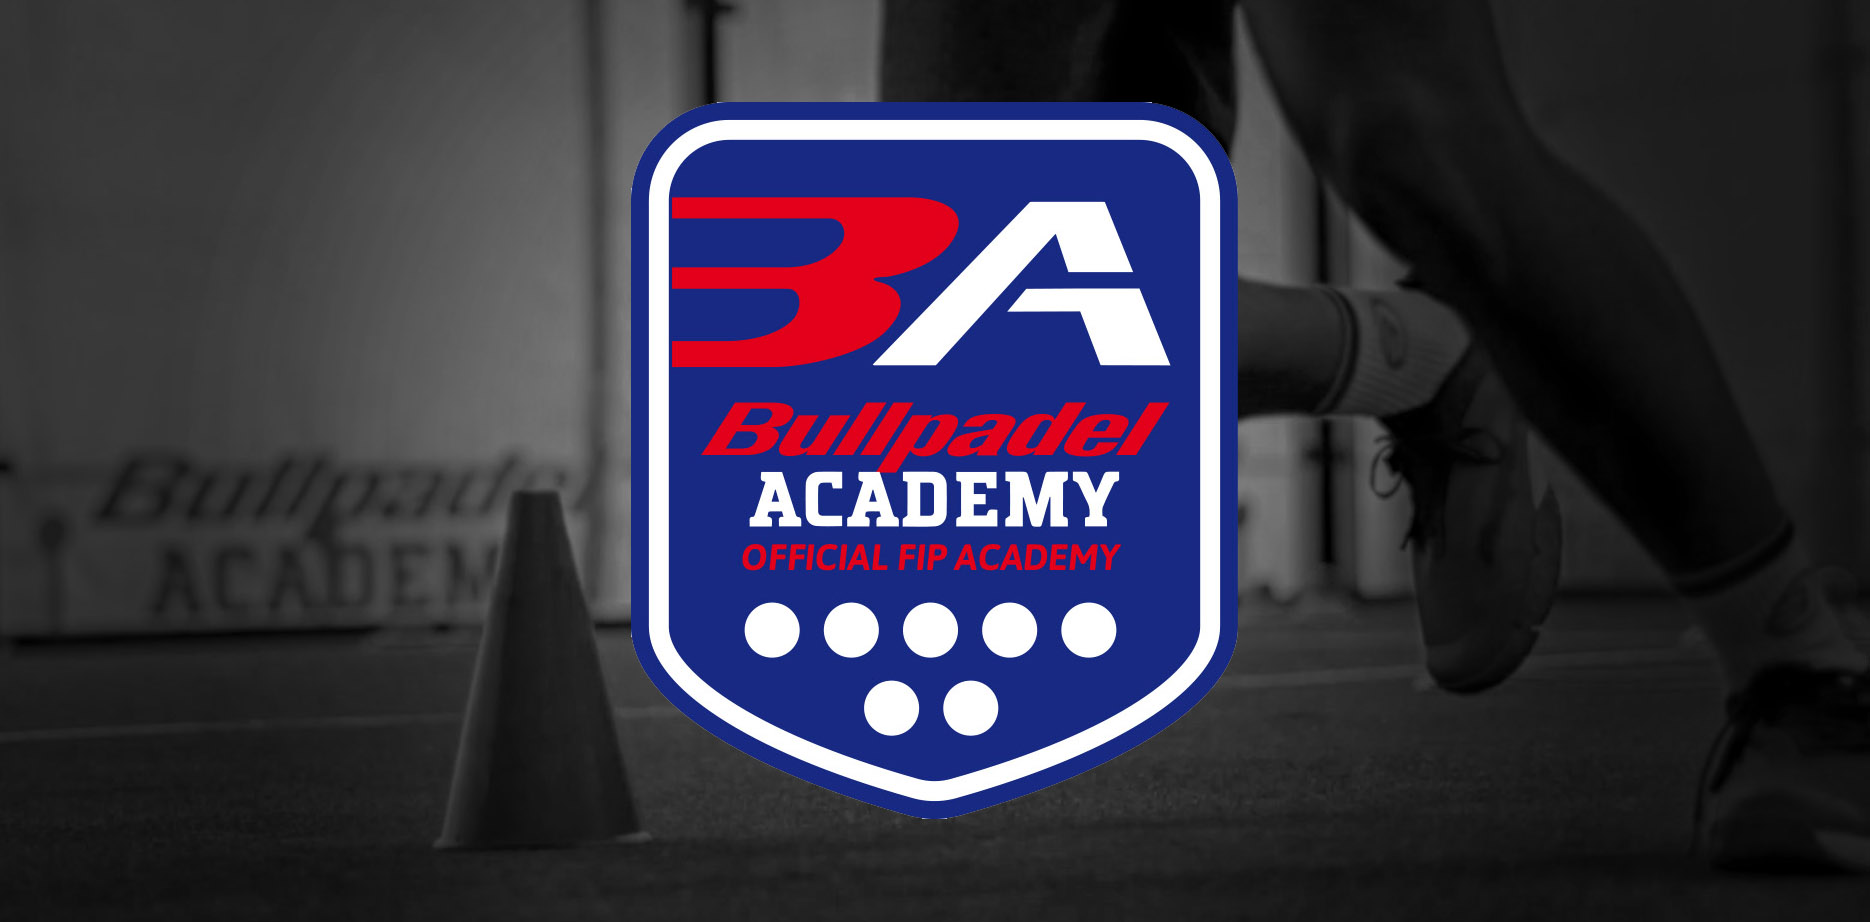 banner bullpadel academy 2.jpg